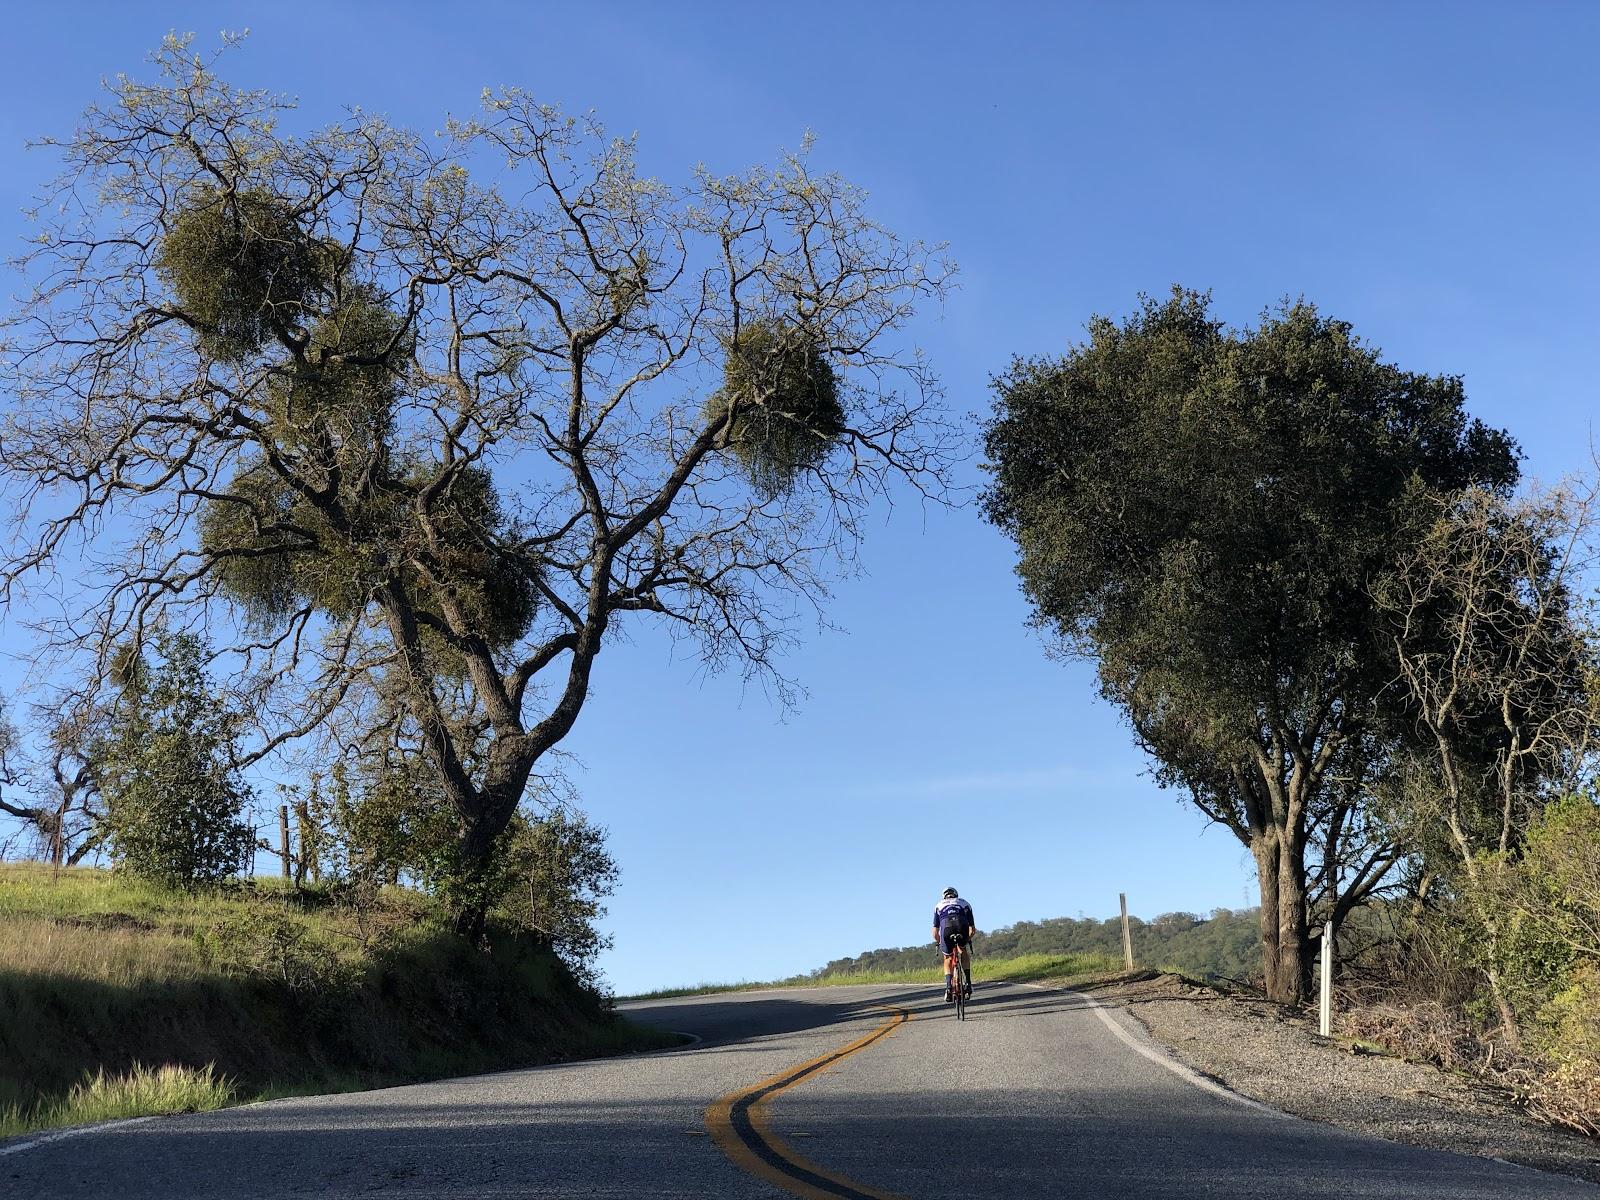 Climbing Mt. Hamilton  by bike - cyclist on bike on road riding between oak trees.